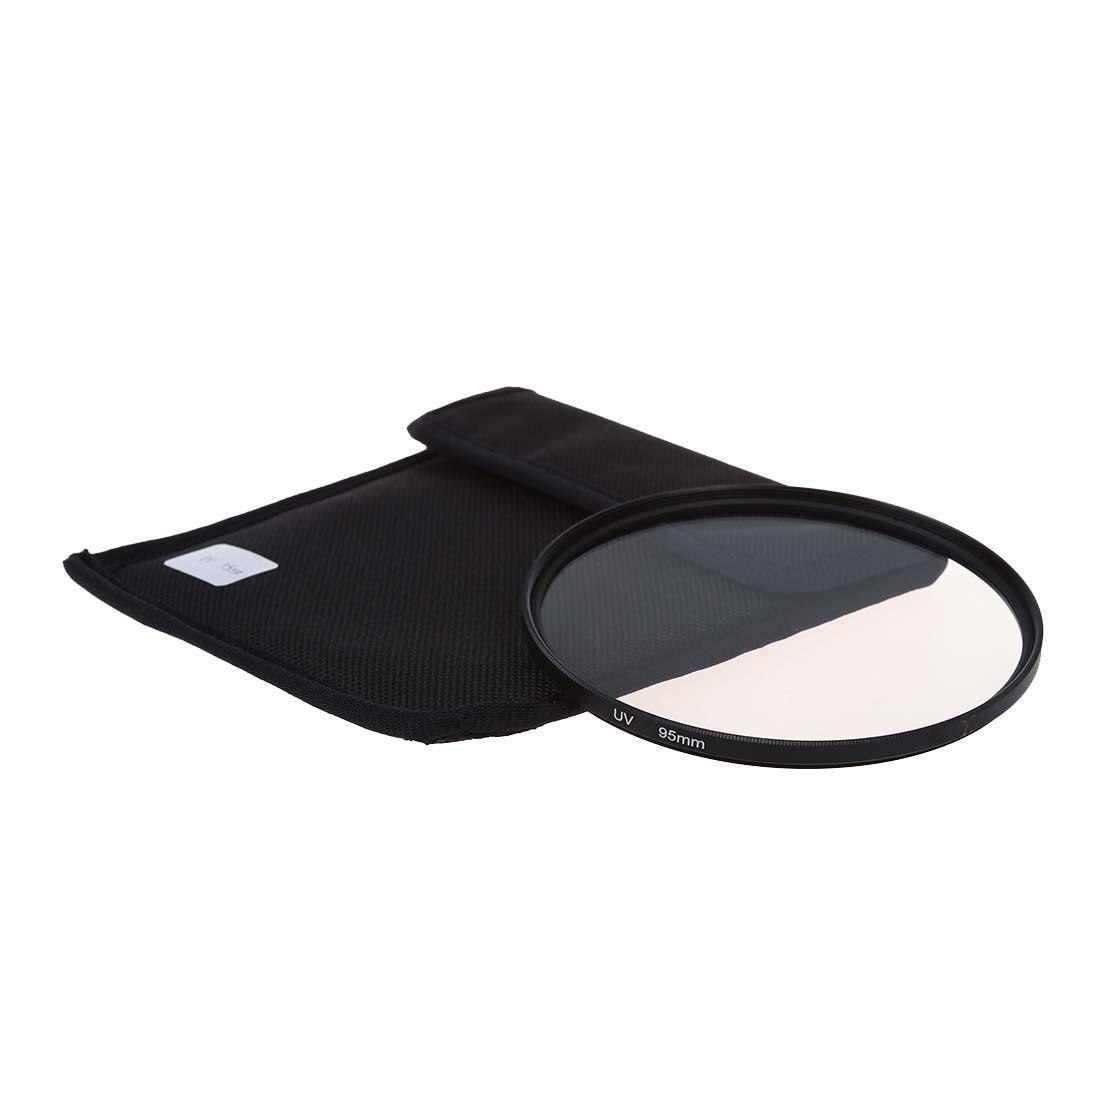 New View 95mm UV filter lens ultraviolet protection for camera lens